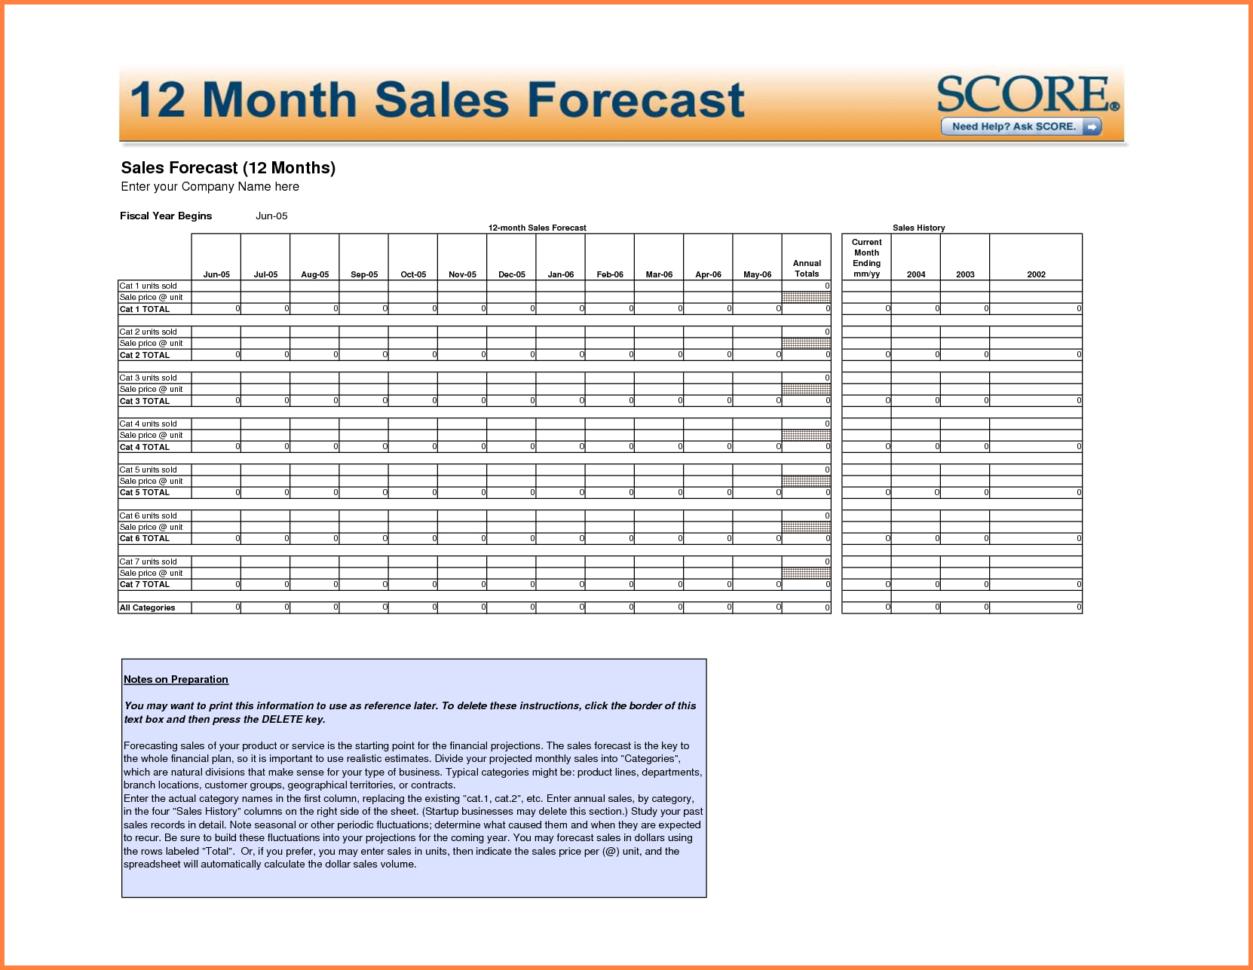 Sample Sales Forecast Spreadsheet Intended For Sales Forecast Template For Startup Business  Homebiz4U2Profit